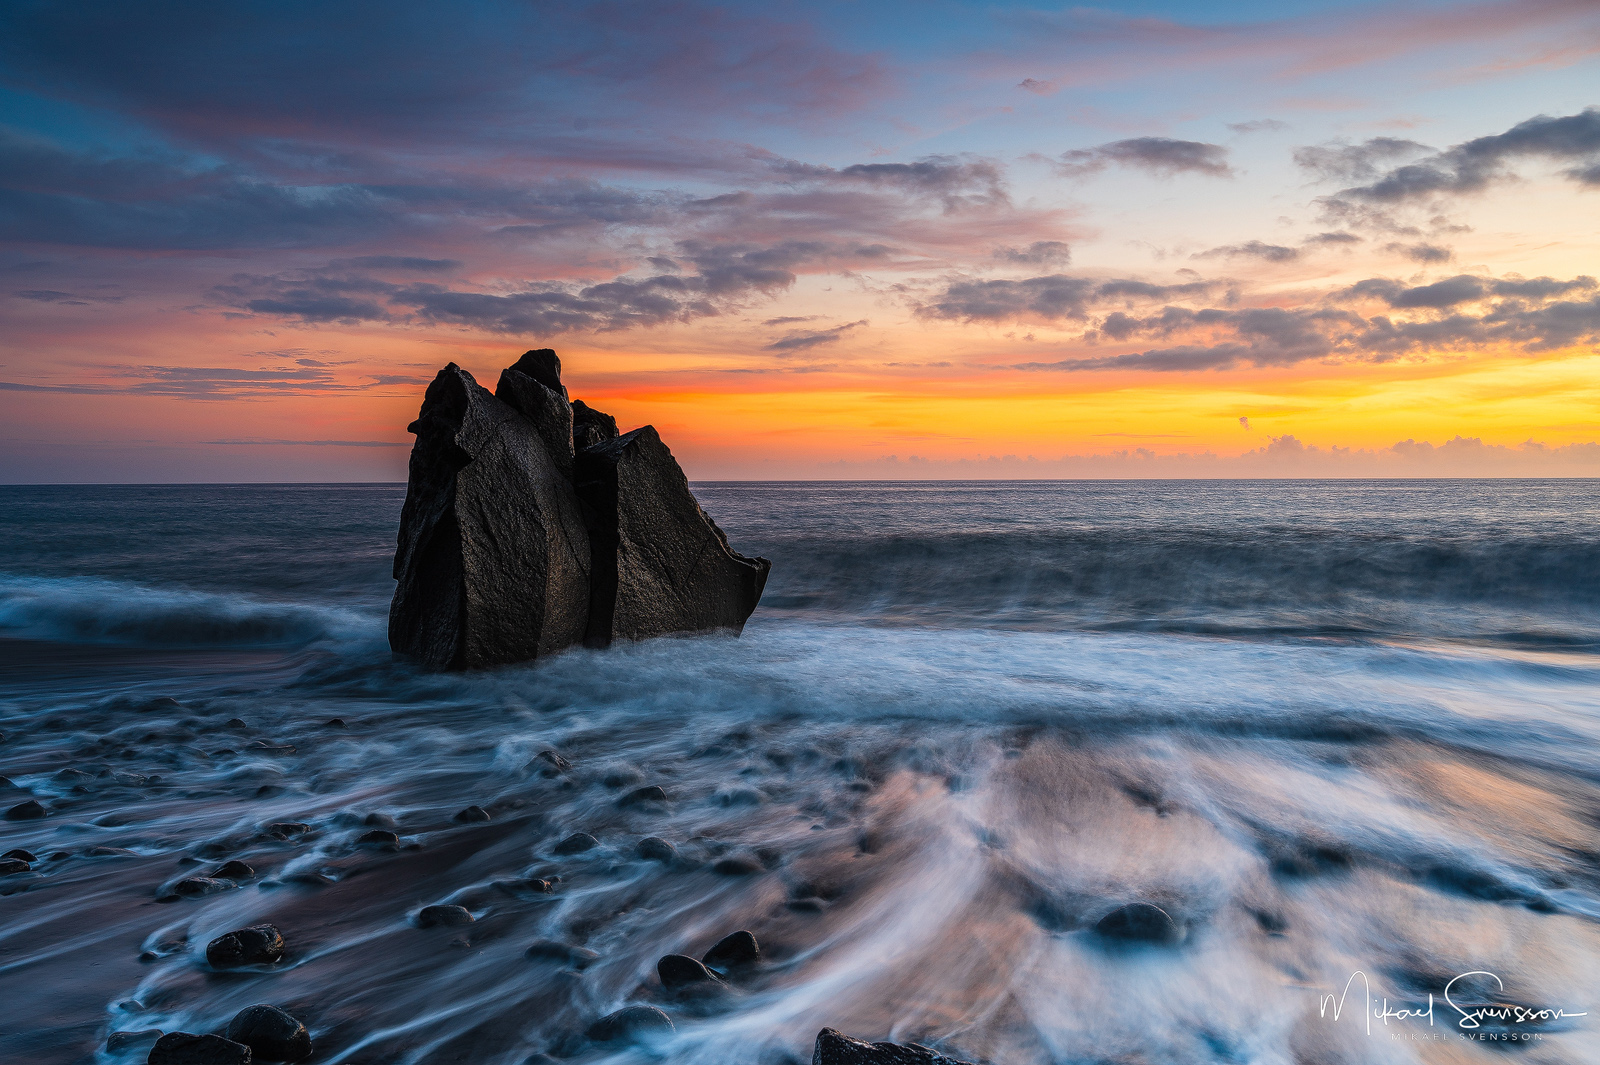 Sunset at Praia Formosa, Madeira.